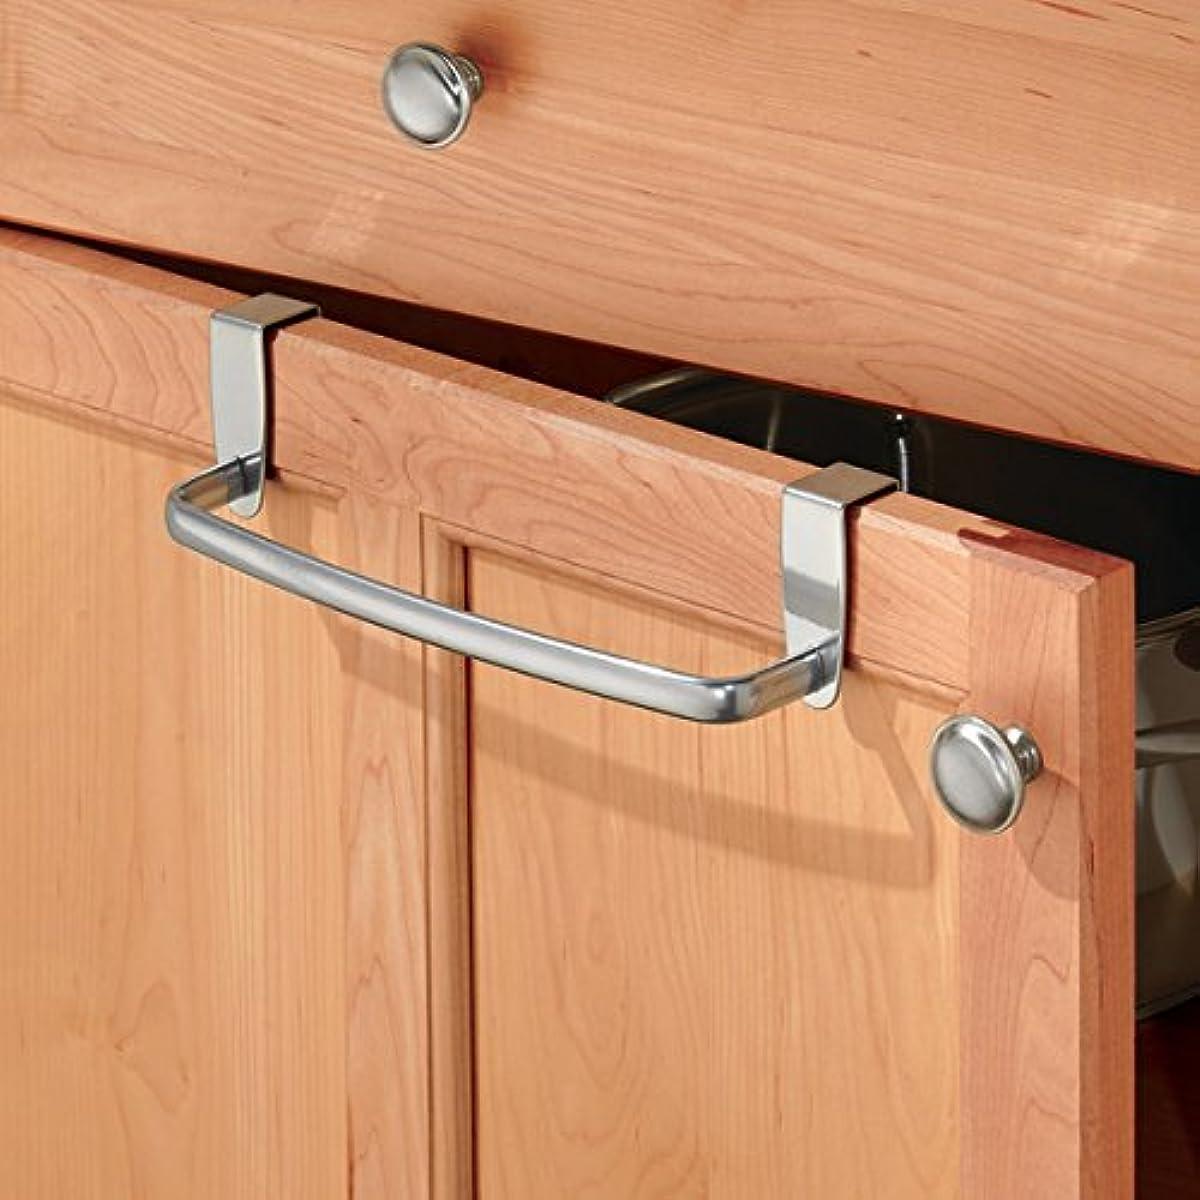 Kitchen Dish Towel Holder Bar Over Cabinet Door Hanging